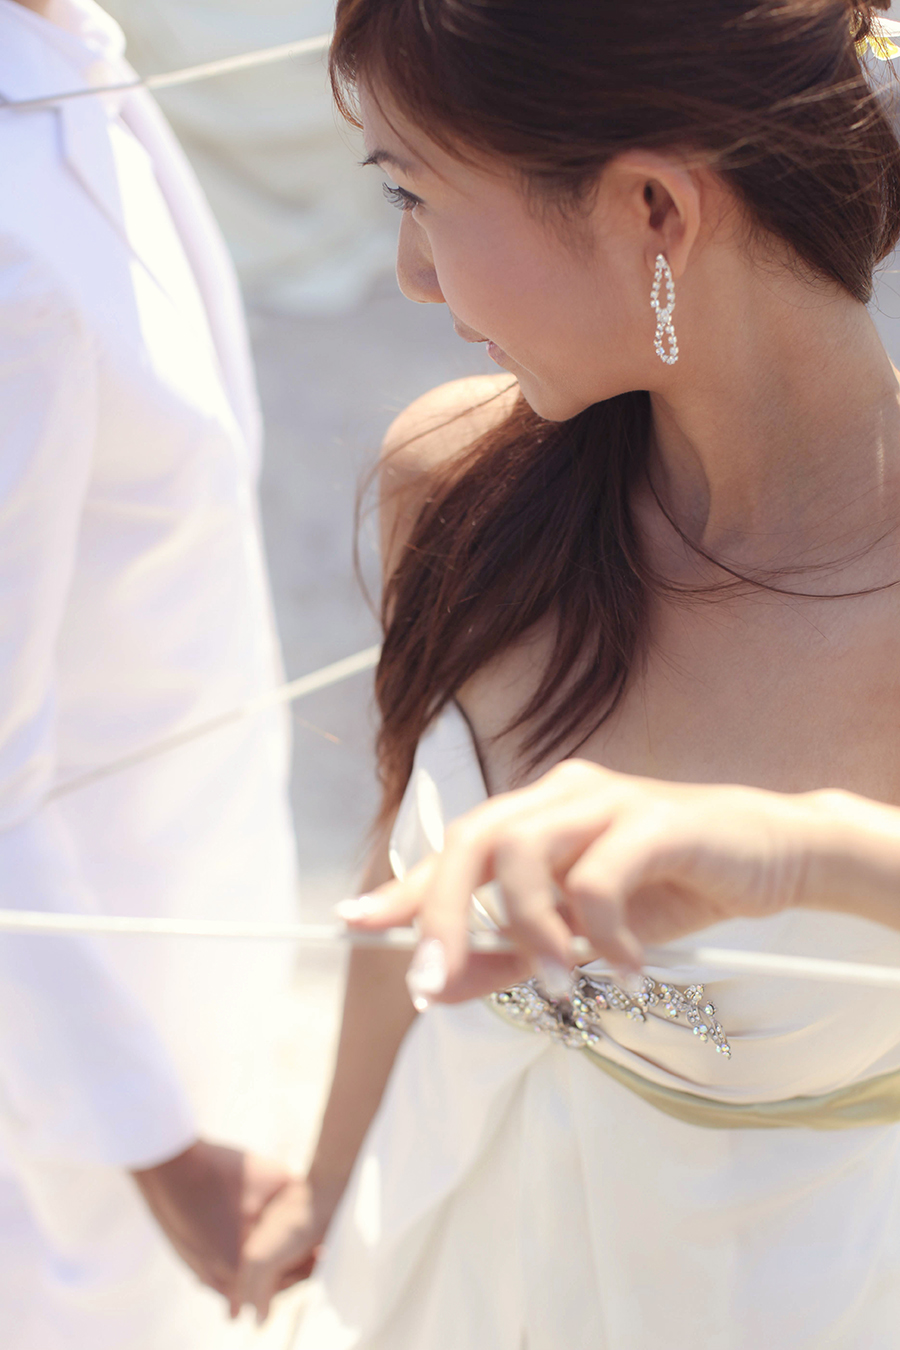 santorini greece . wedding photography by kurt ahs . 3060.jpg